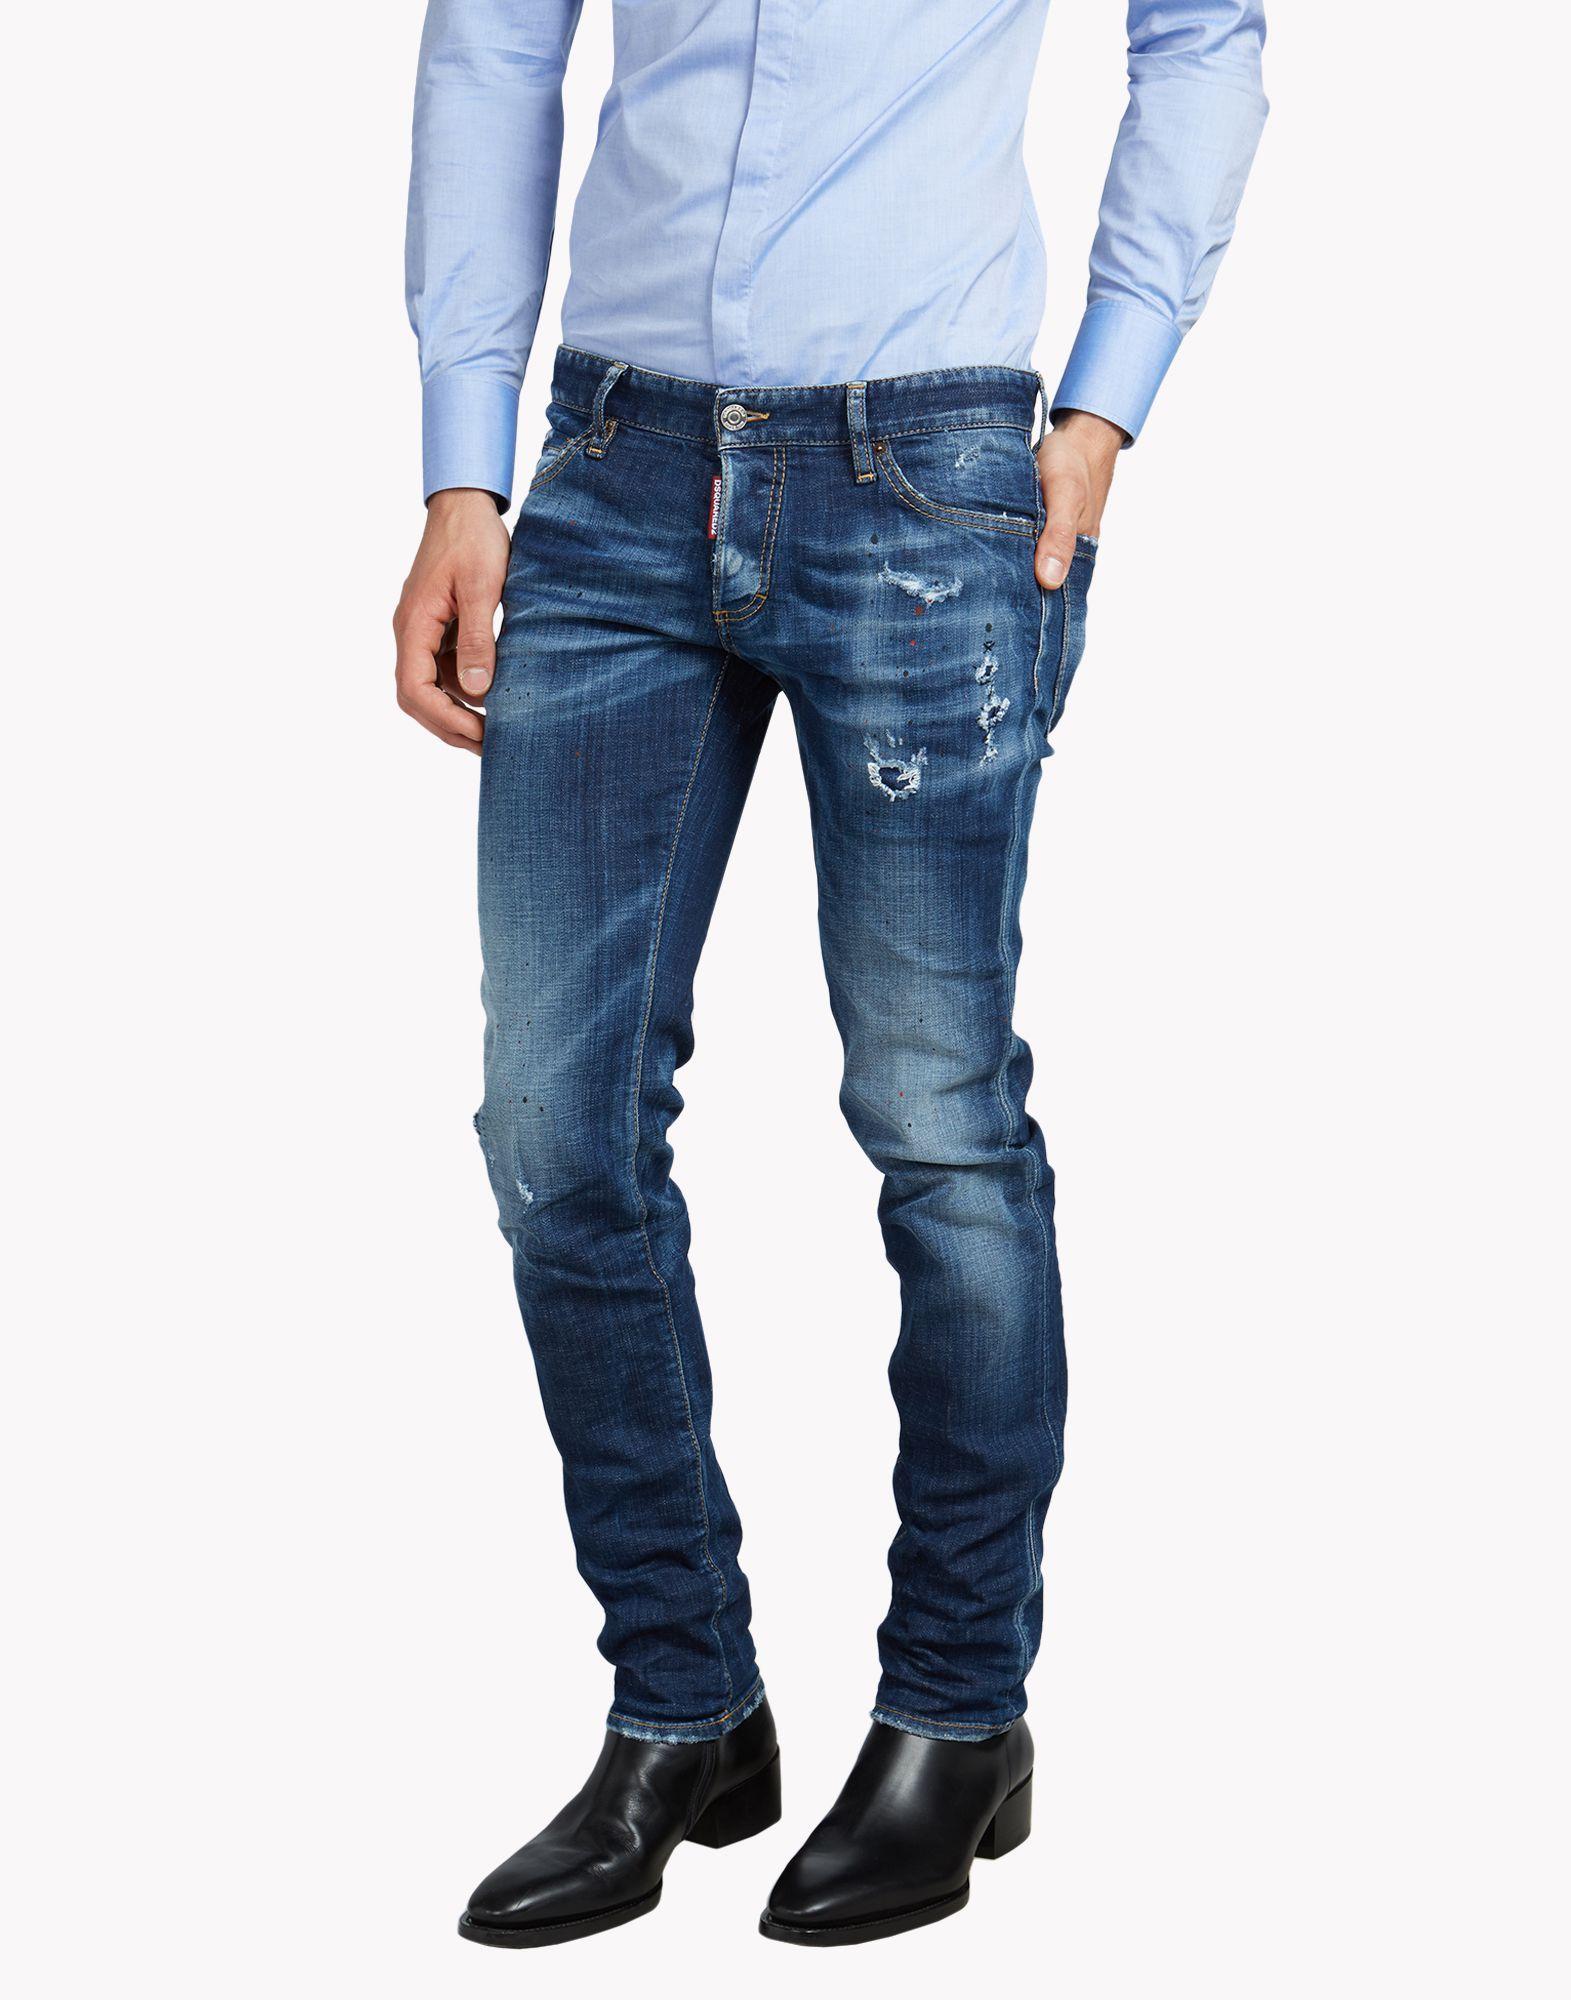 717619fdfe Slim Jeans - 5 Bolsillos Hombre en la tienda online oficial de Dsquared2